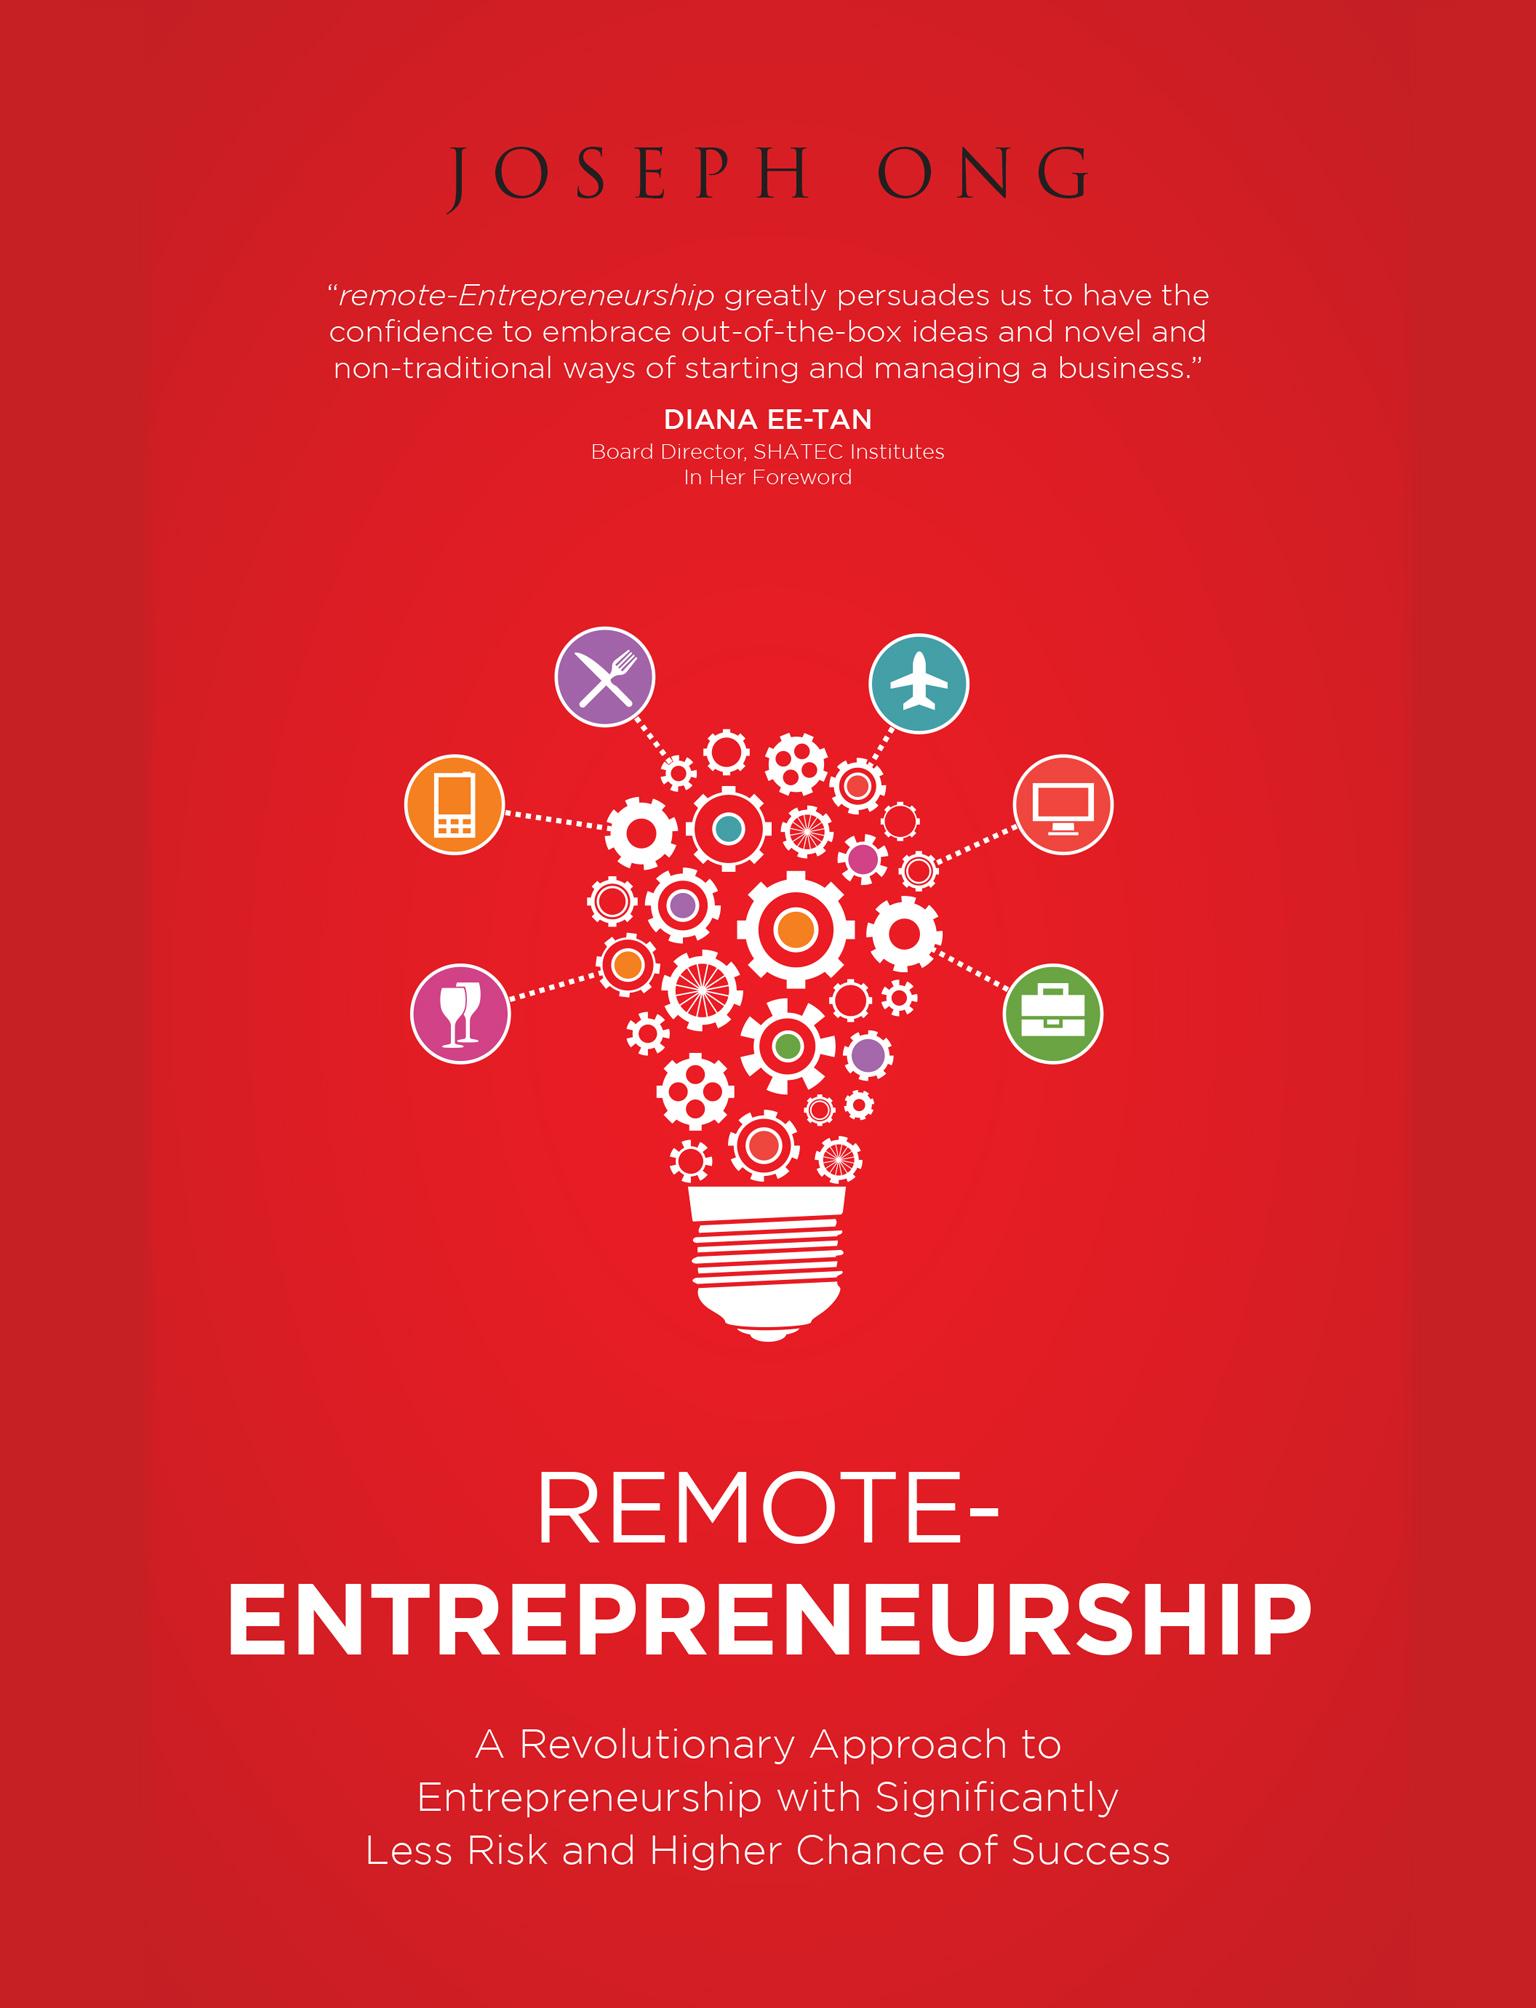 Remote Entrepreneurship